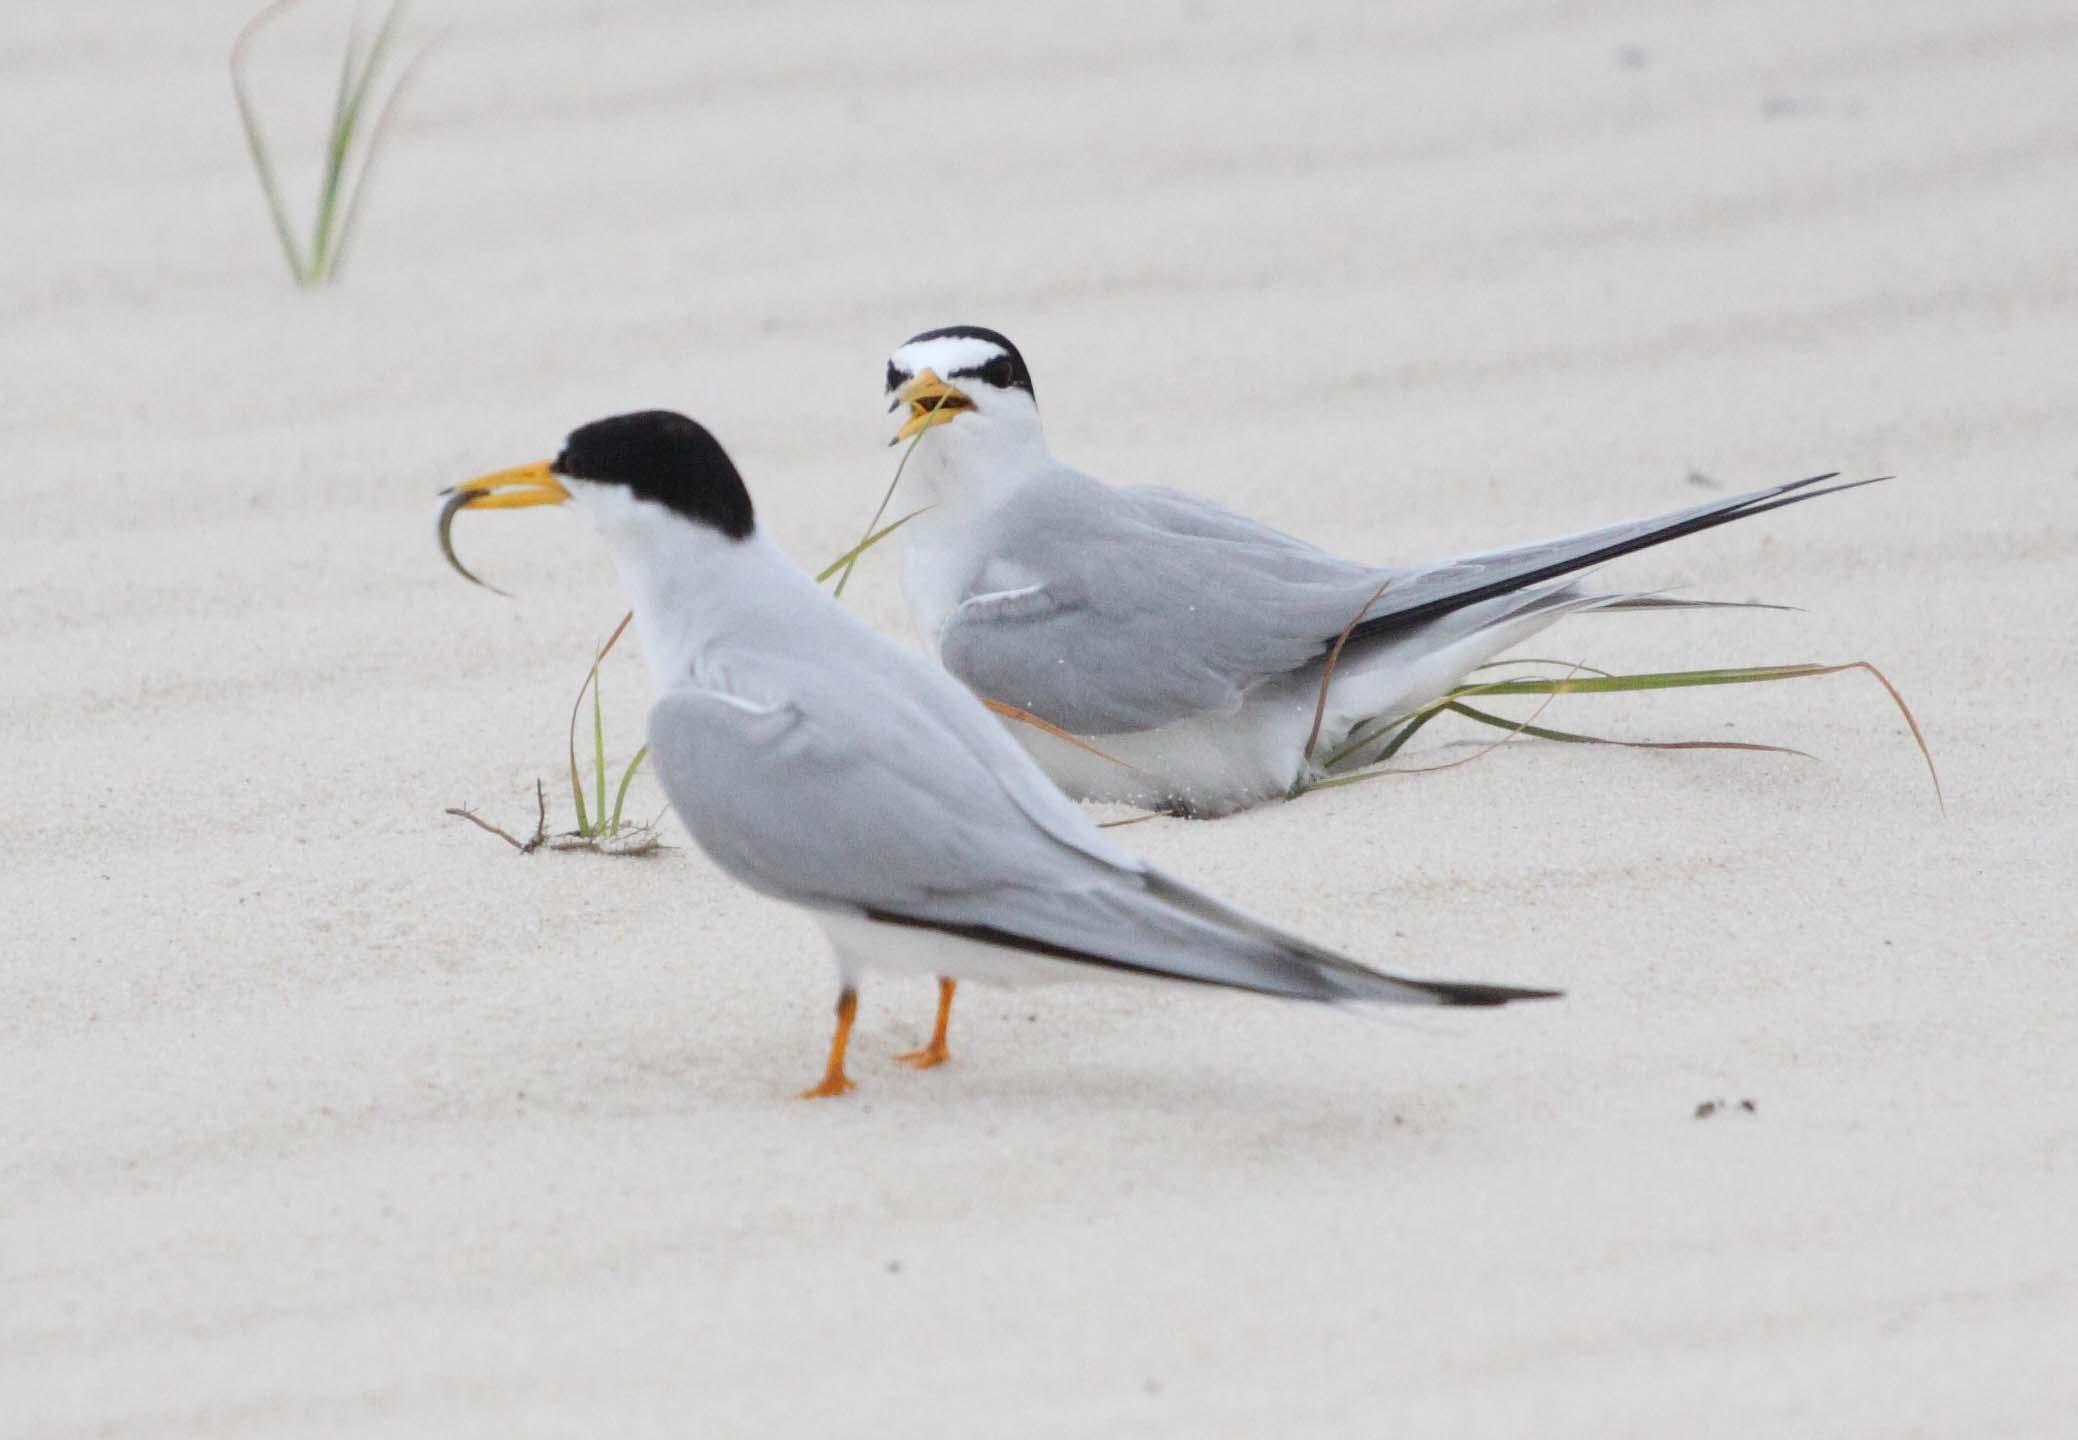 Two birds on the beach